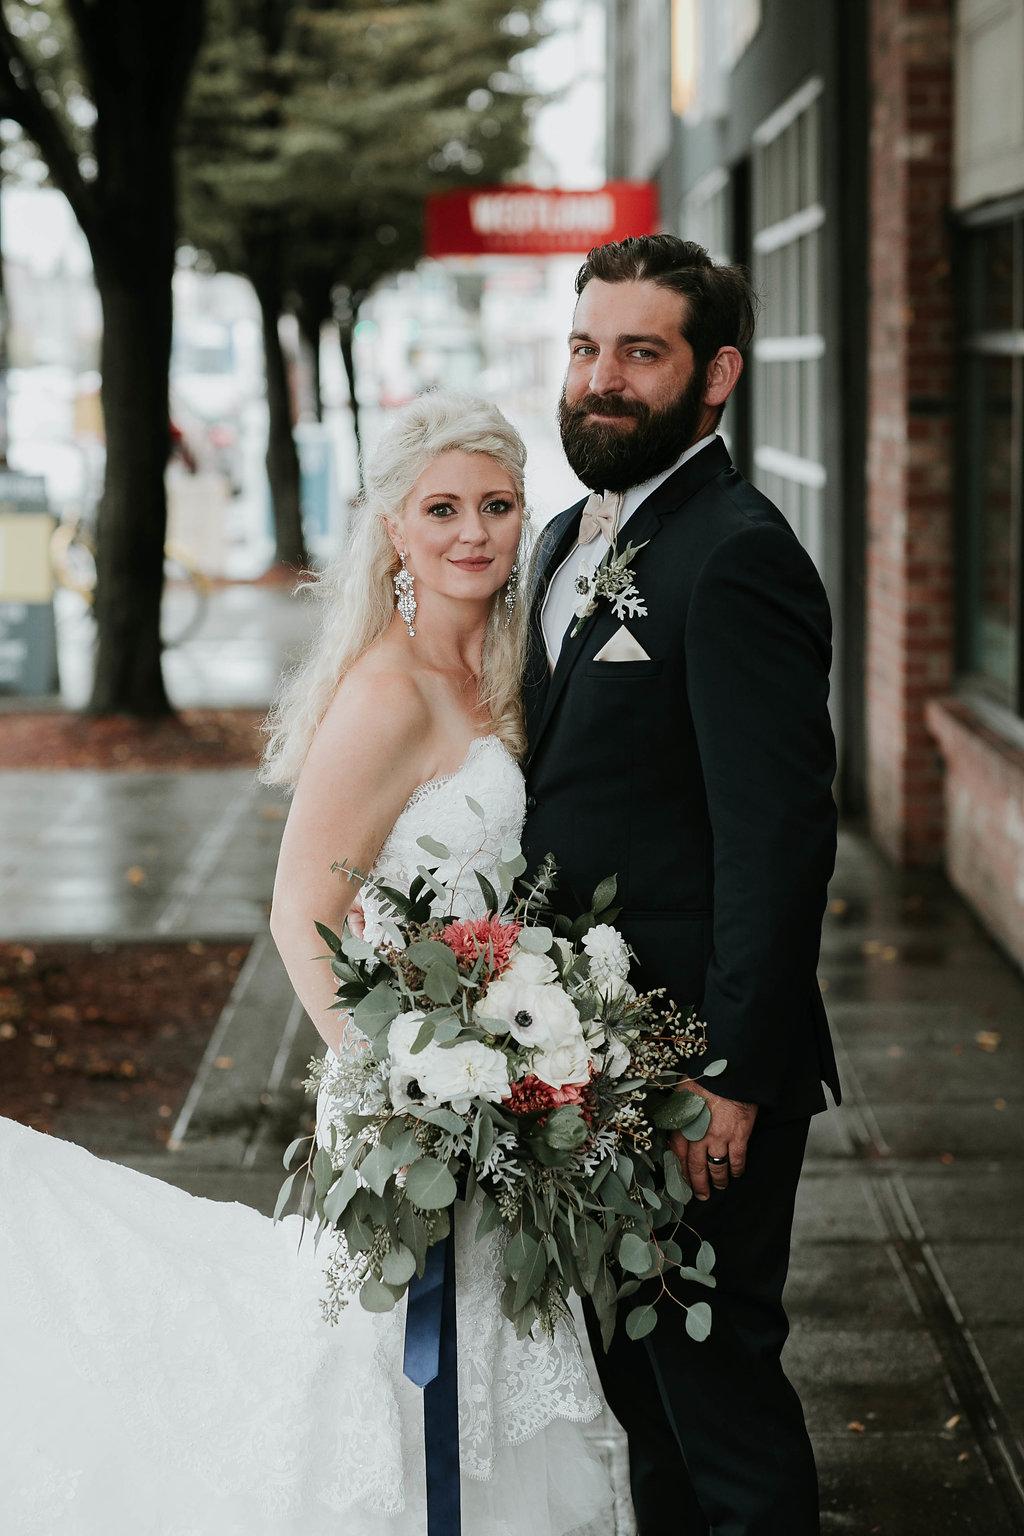 The_Big_Fake_wedding_Seattle_Within_sodo_wedding_by_Adina_Preston_Weddings_95.JPG